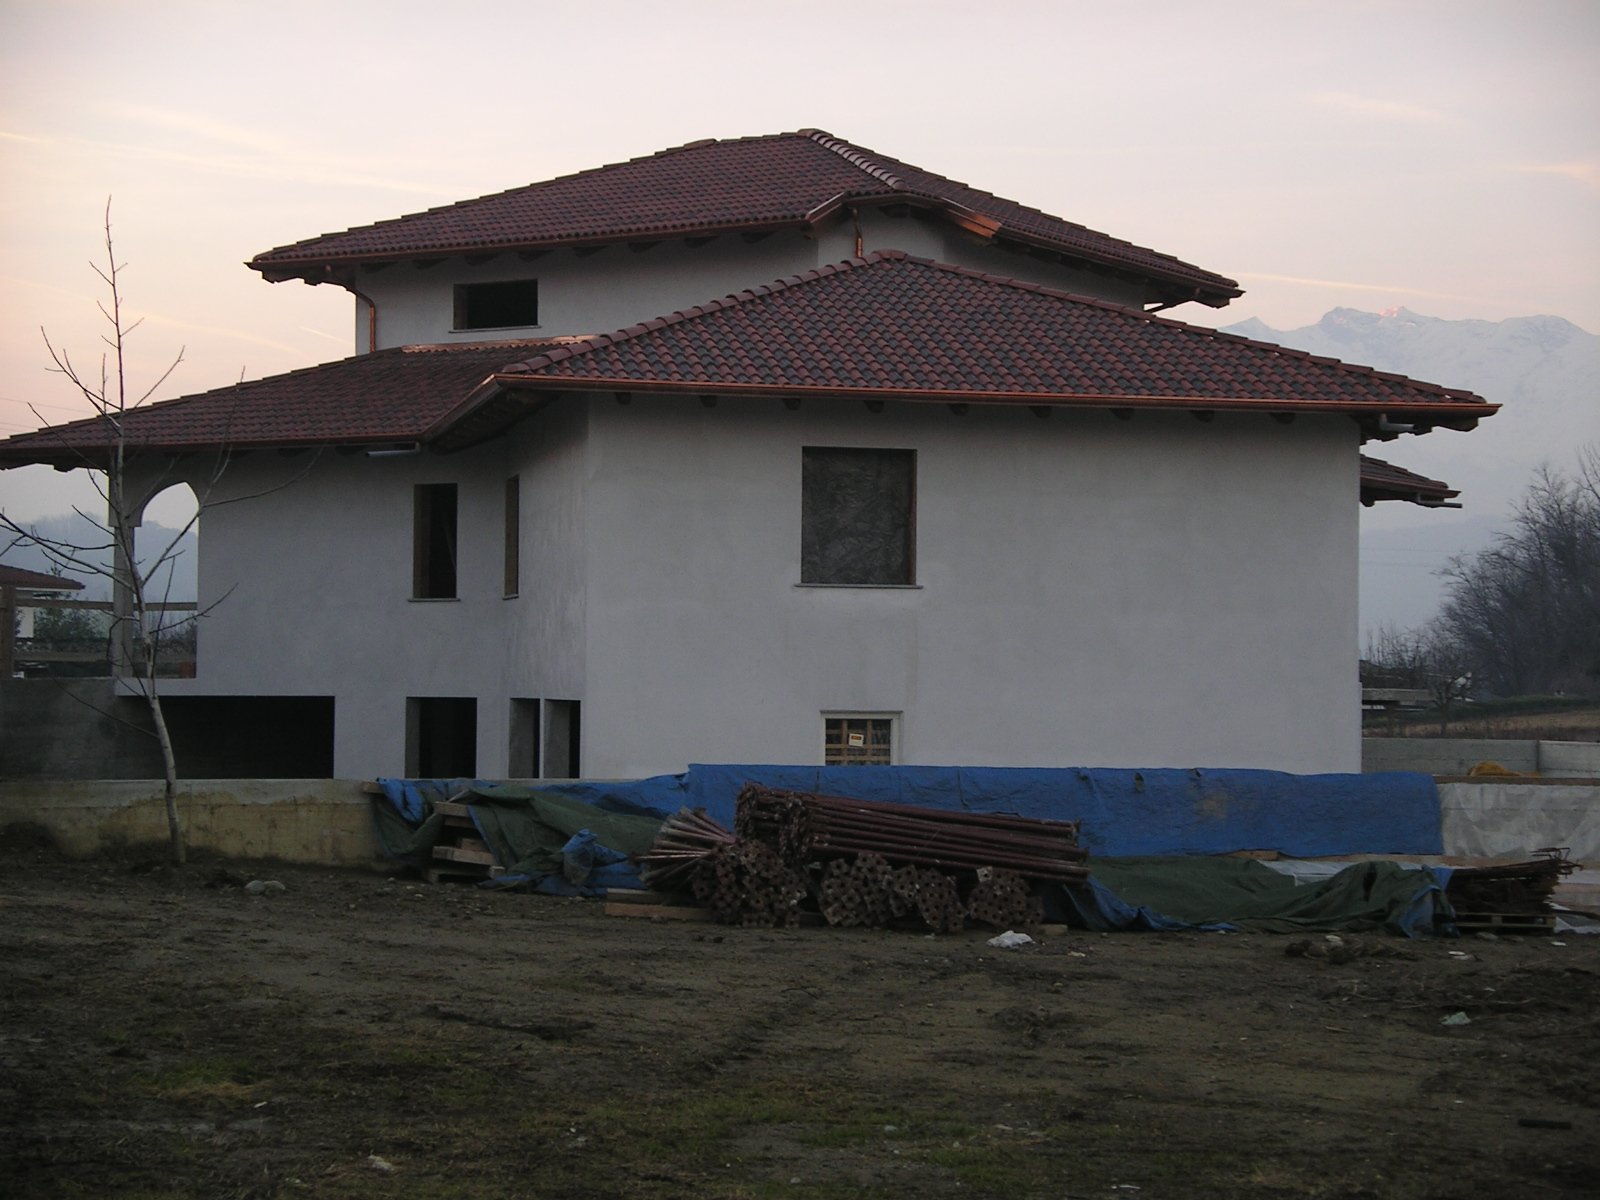 vista di una villa in costruzione